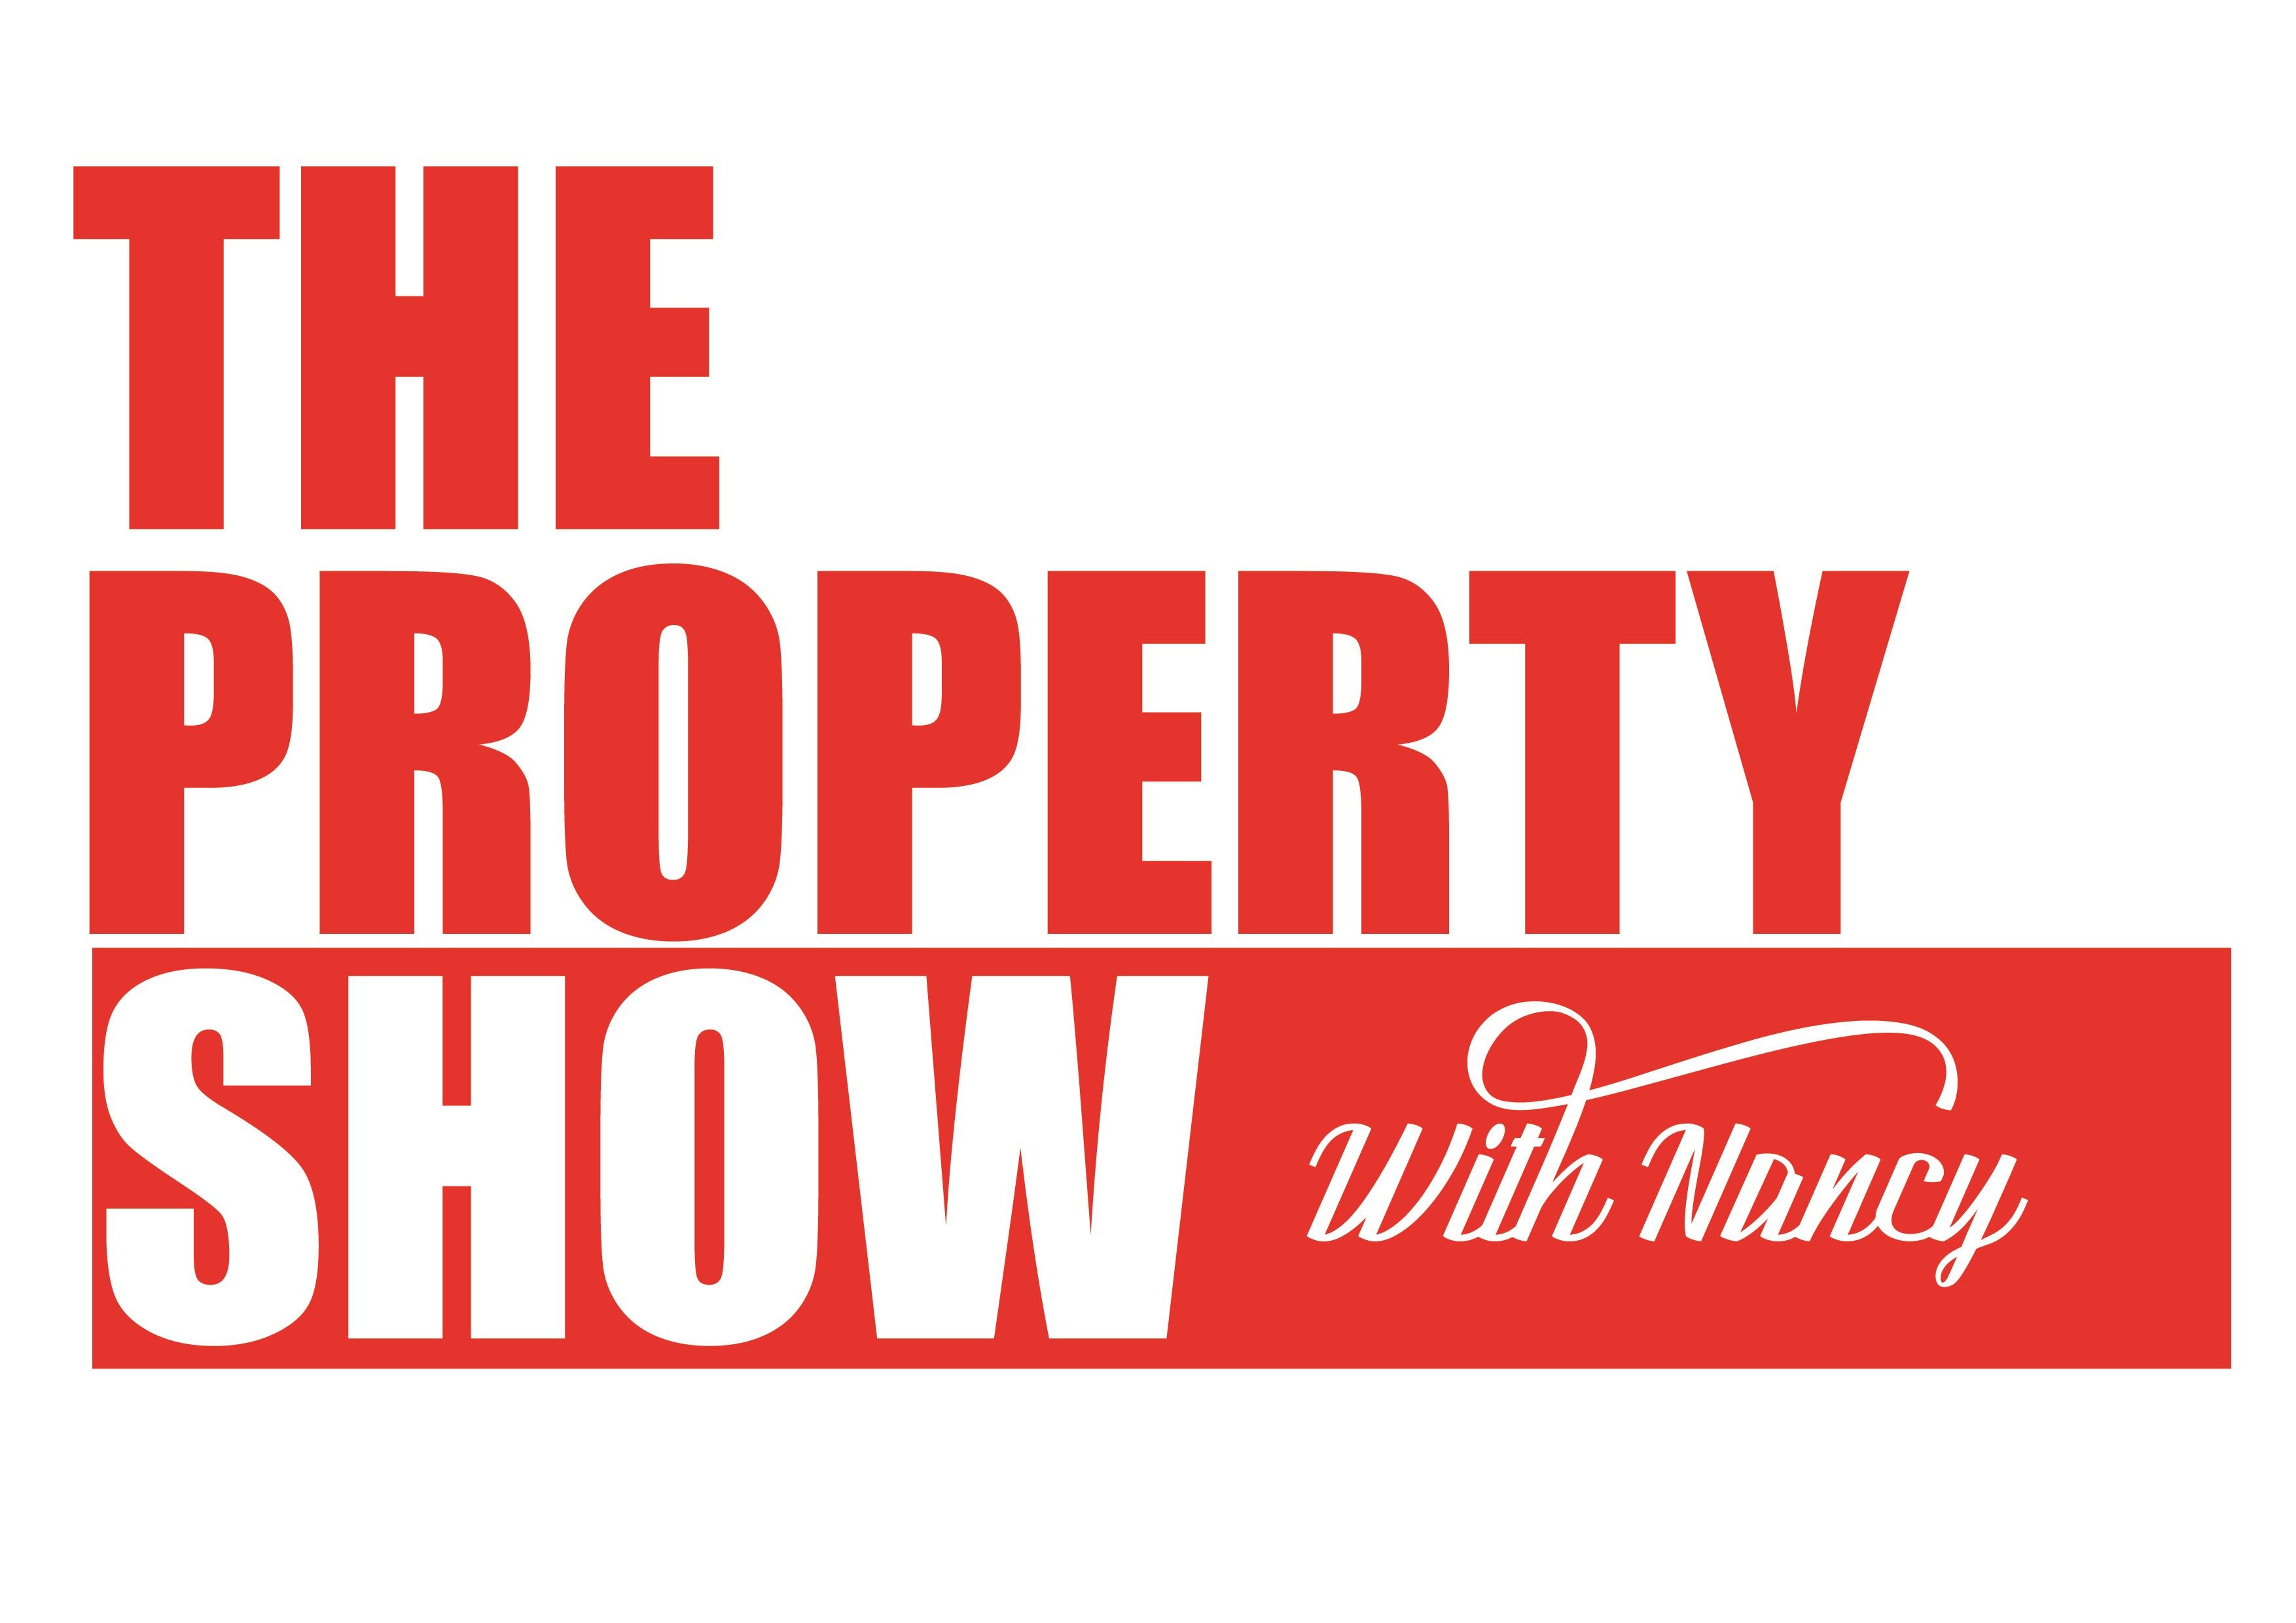 Property_Show_logos-01 (3)_2